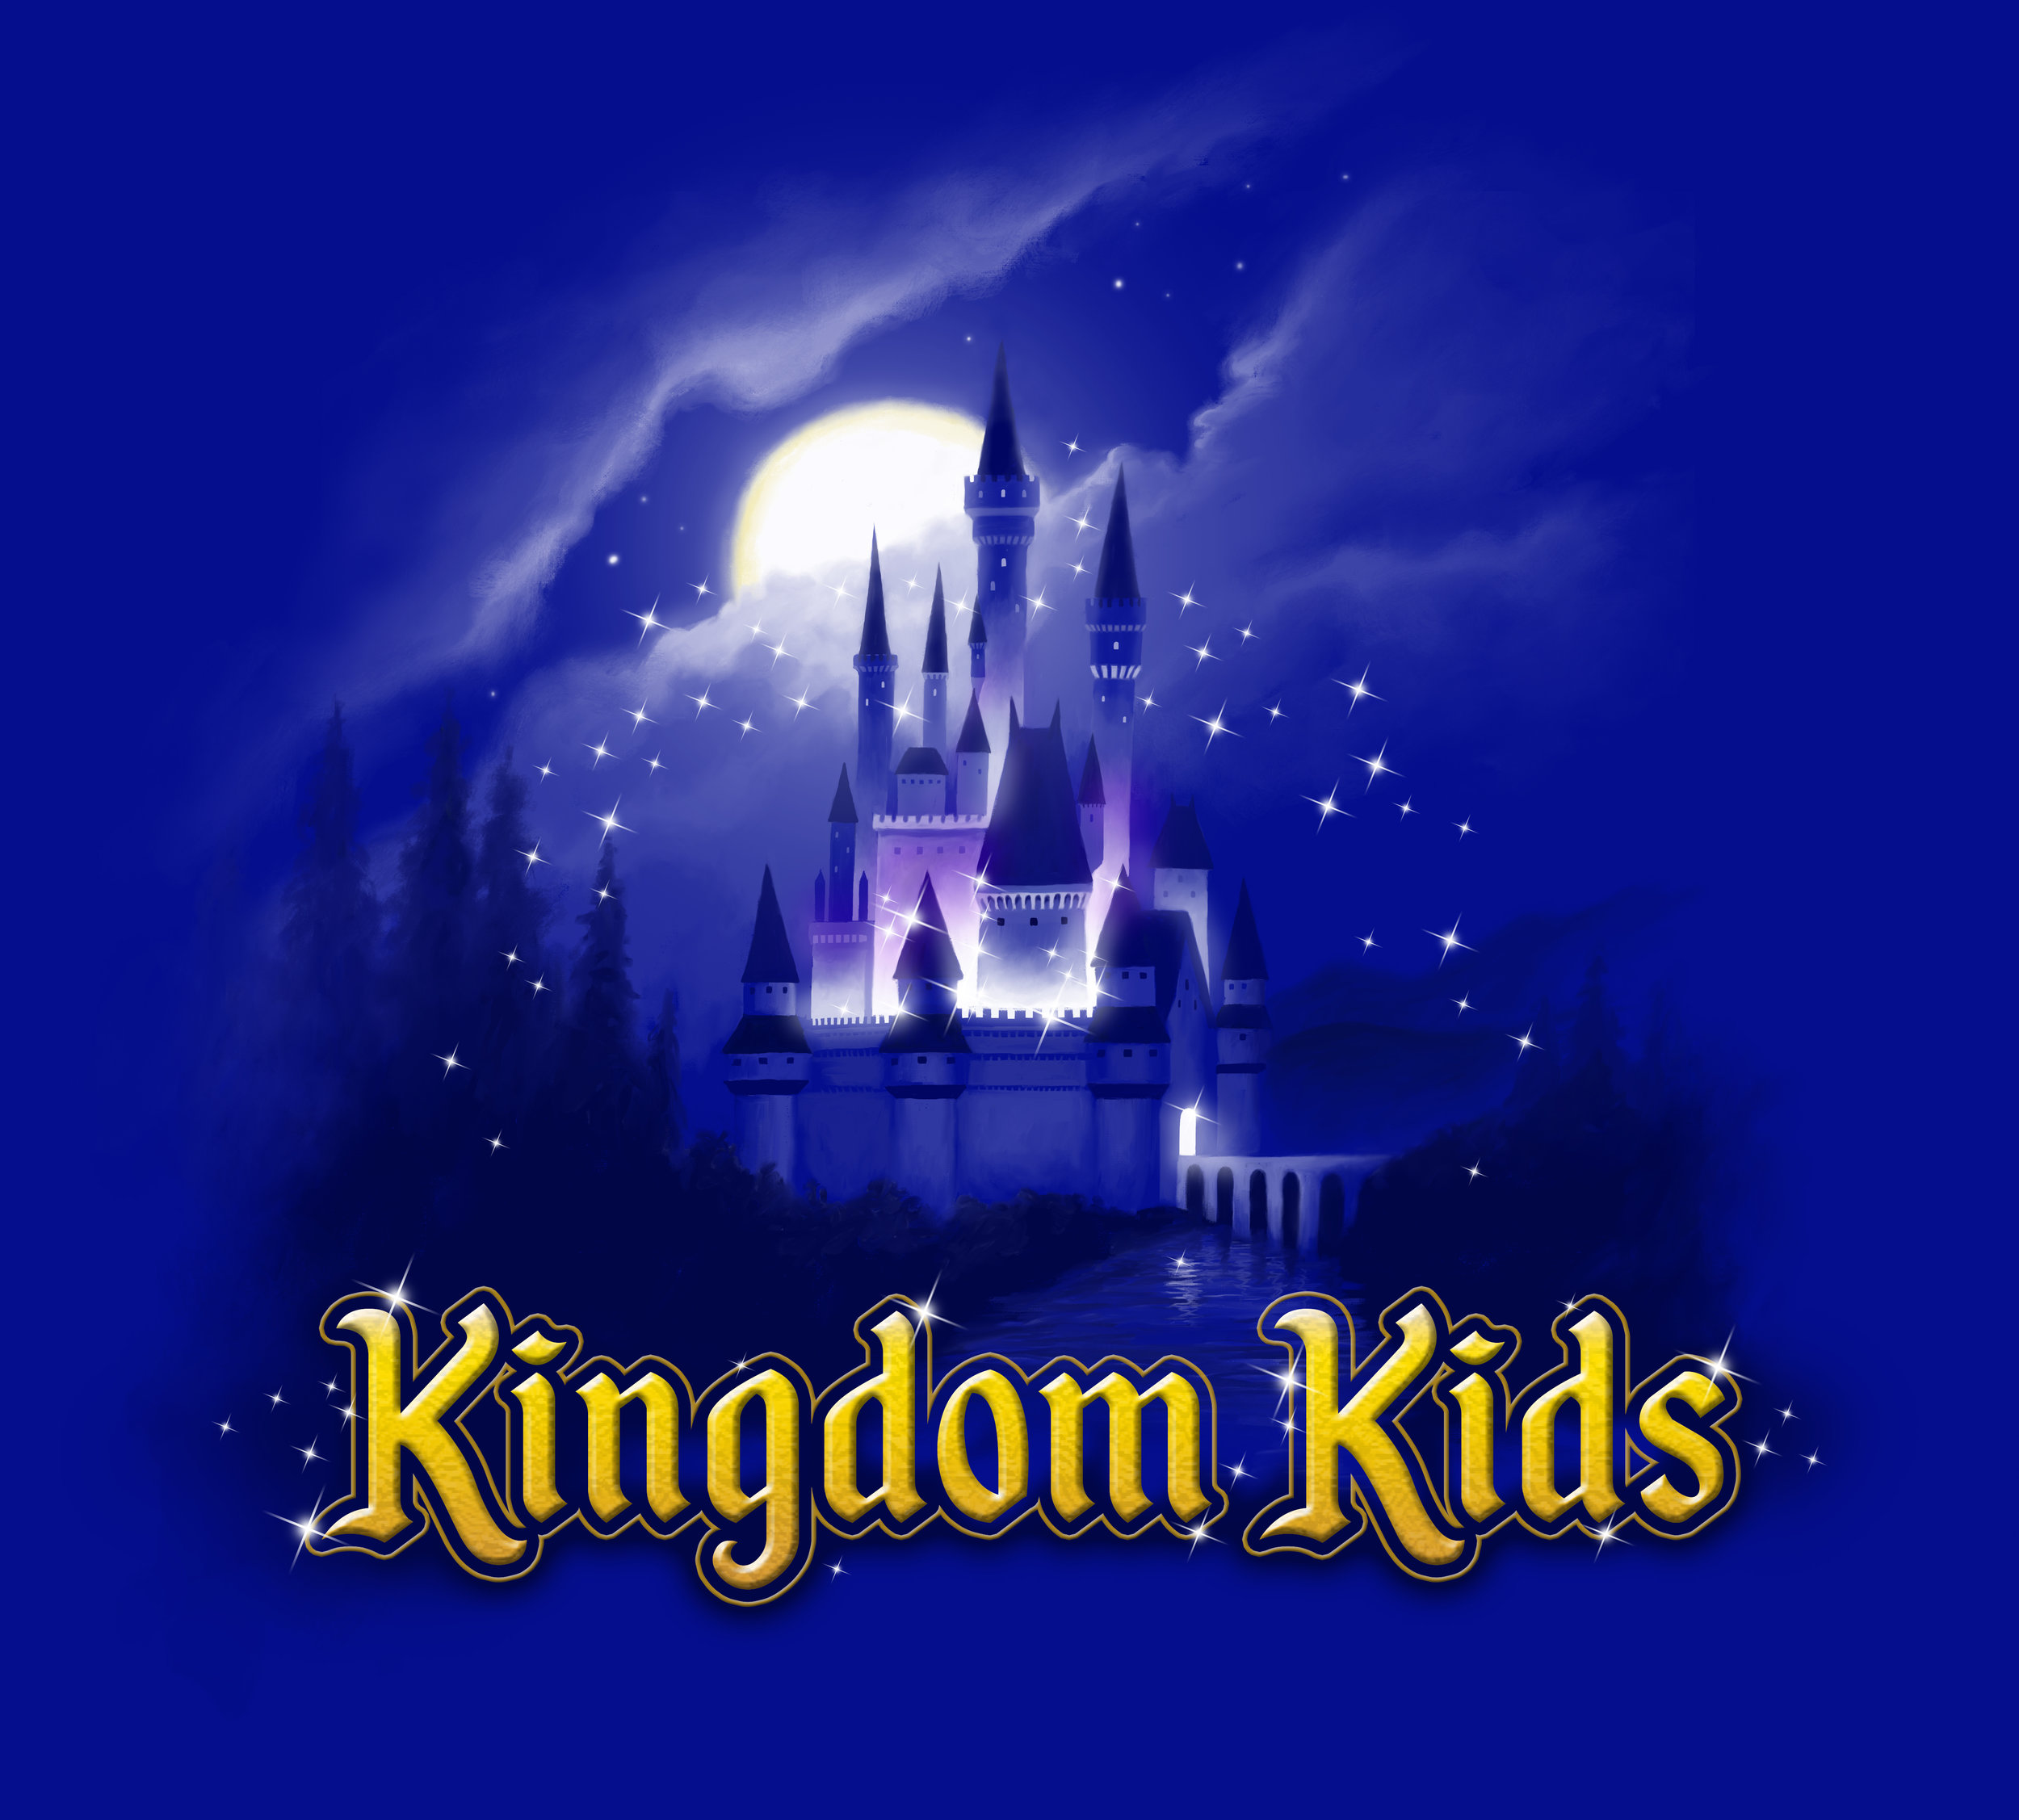 Summer camp kingdom kids